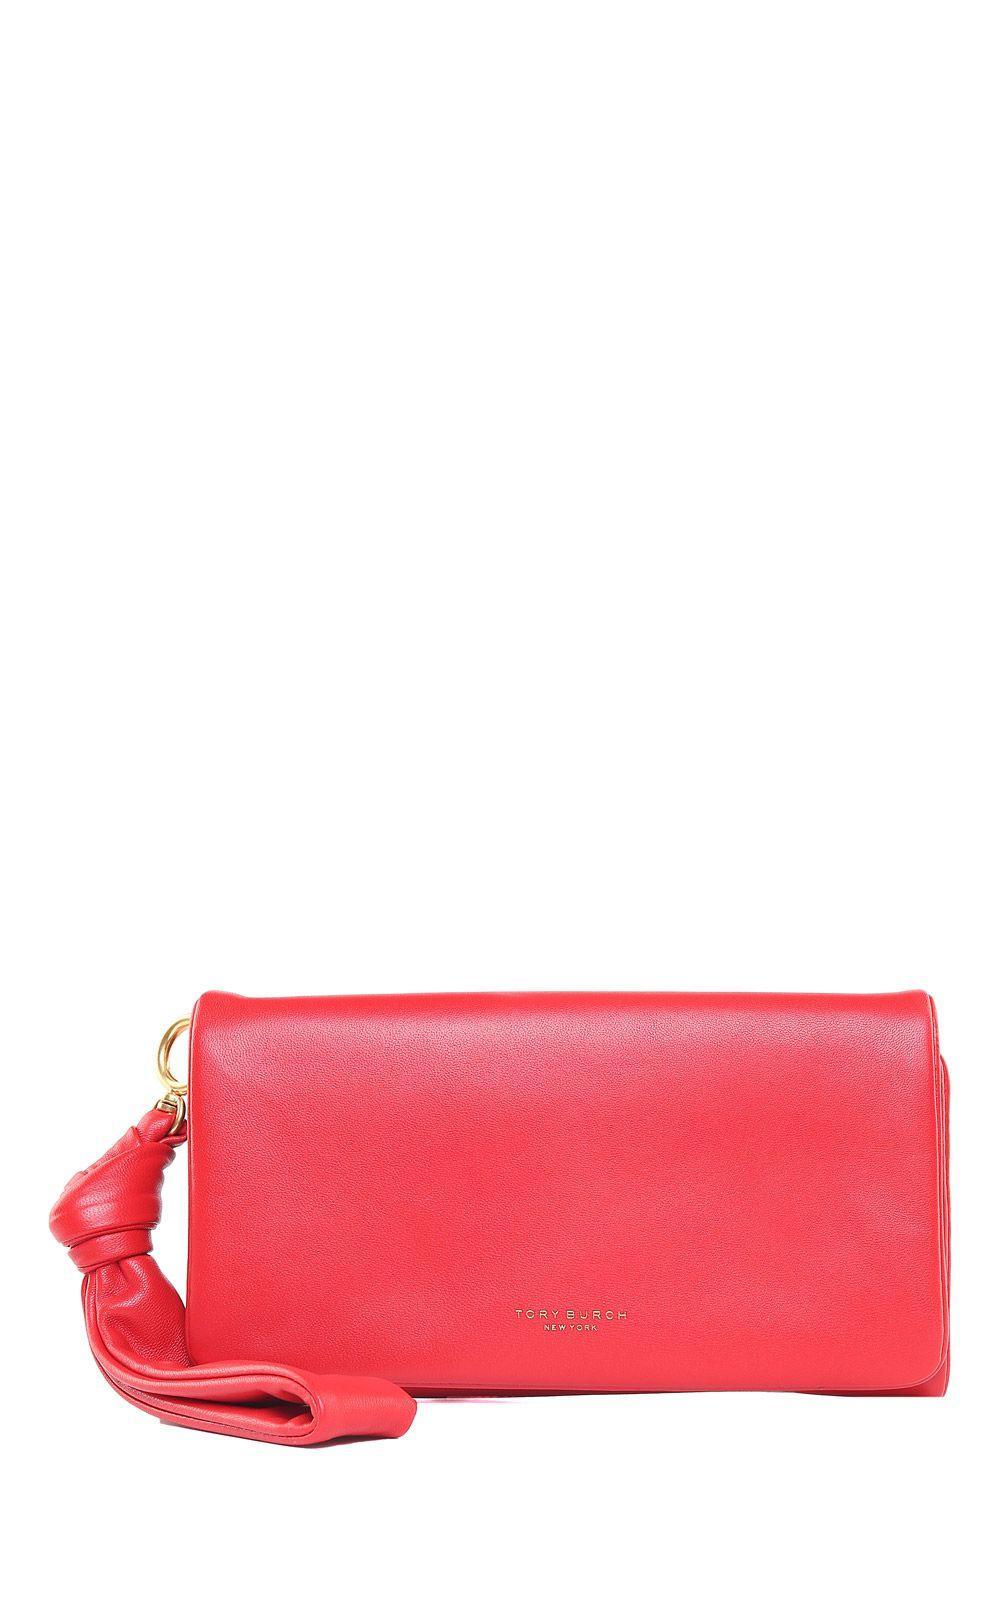 Tory Burch Beau Wristlet Nappa Leather Clutch In Rosso